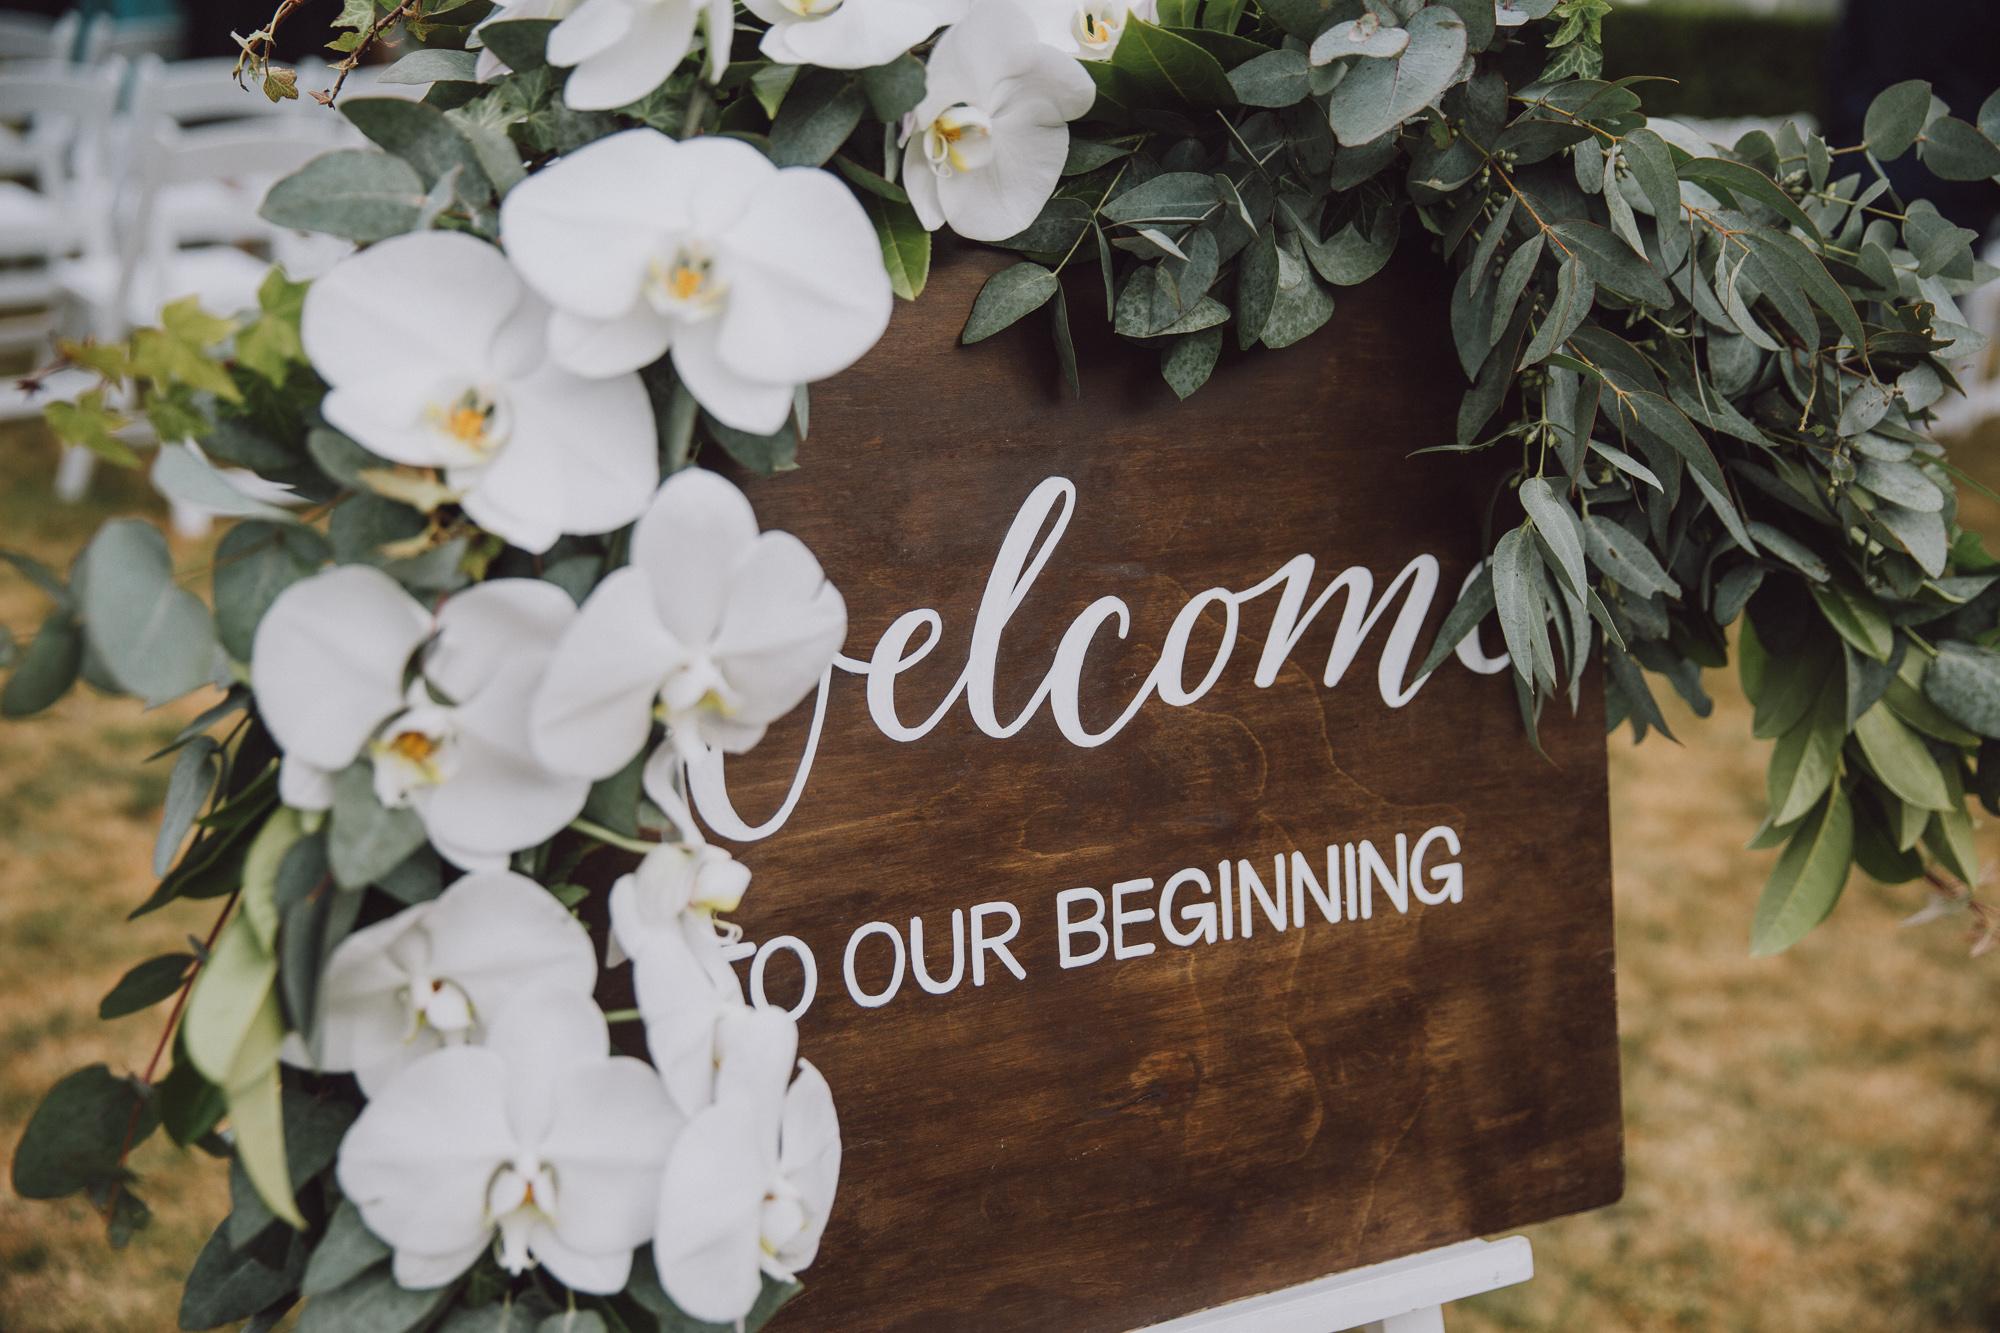 Welcome sign hire in Queenstown NZ